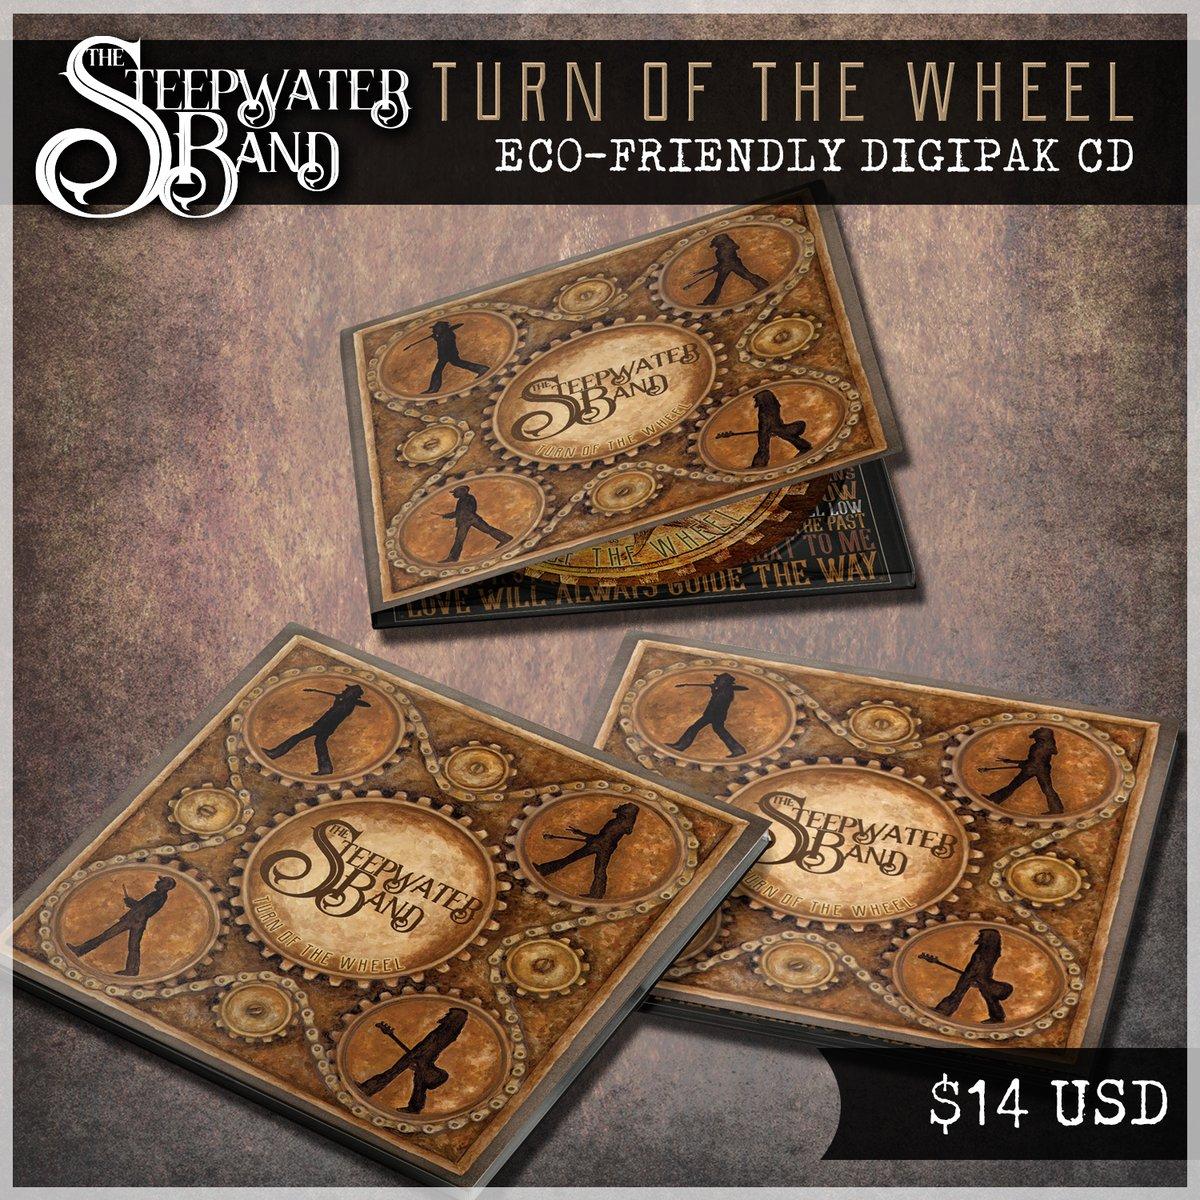 Turn Of The Wheel DigiPak CD